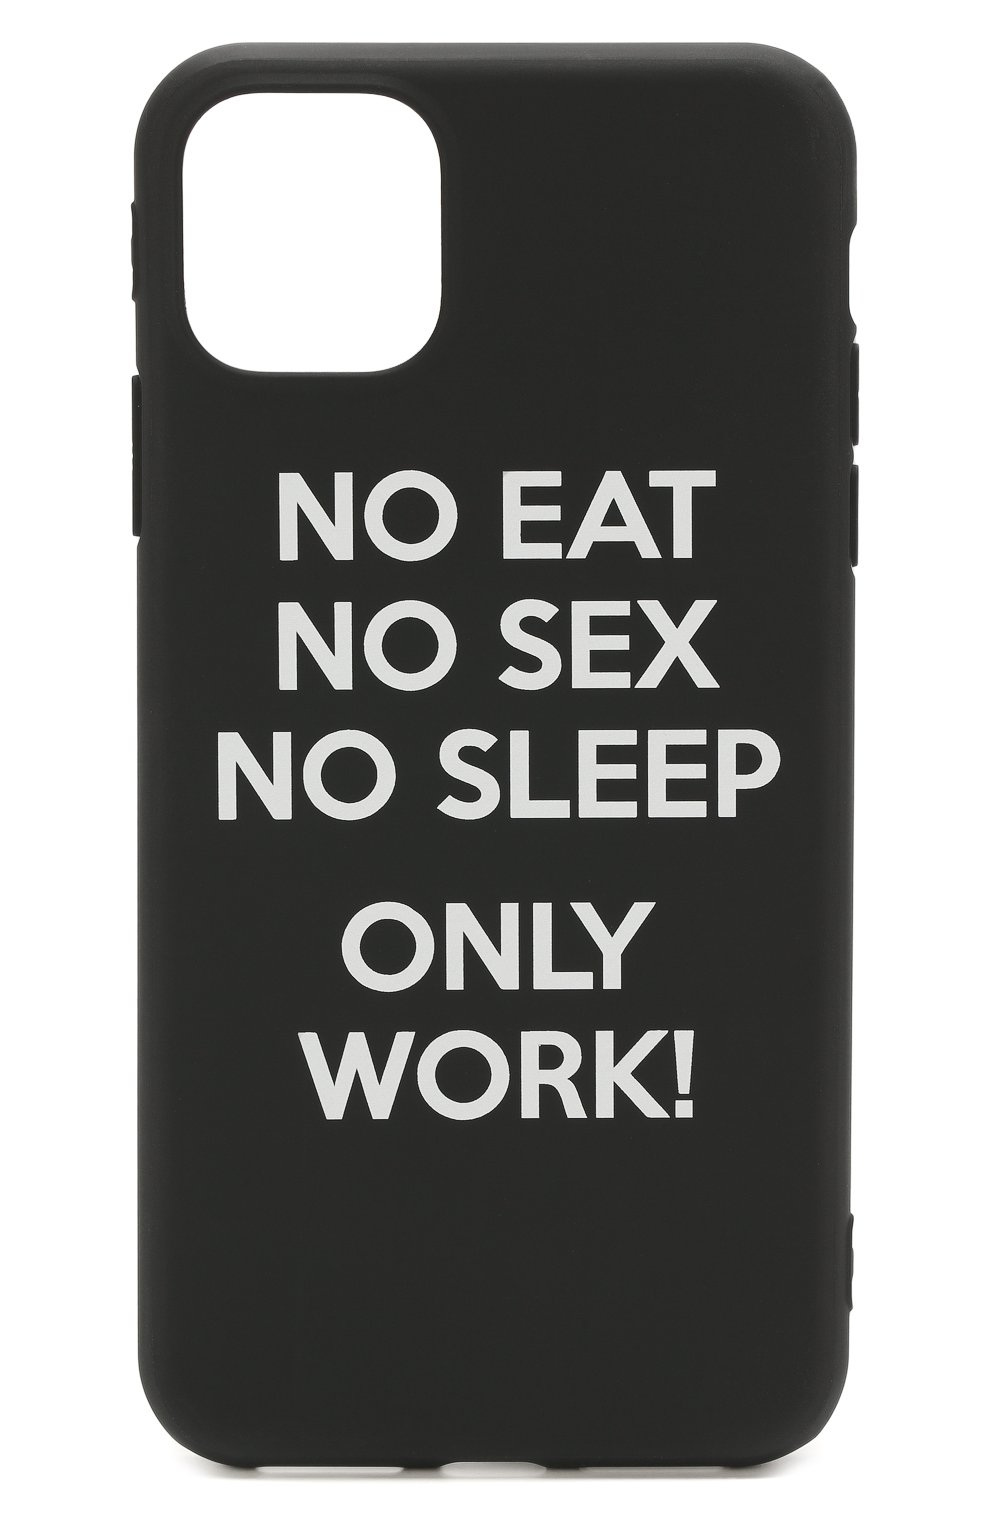 Мужской чехол для iphone 11 pro max MISHRABOO черного цвета, арт. No eat no sex 11 Pro Max   Фото 1